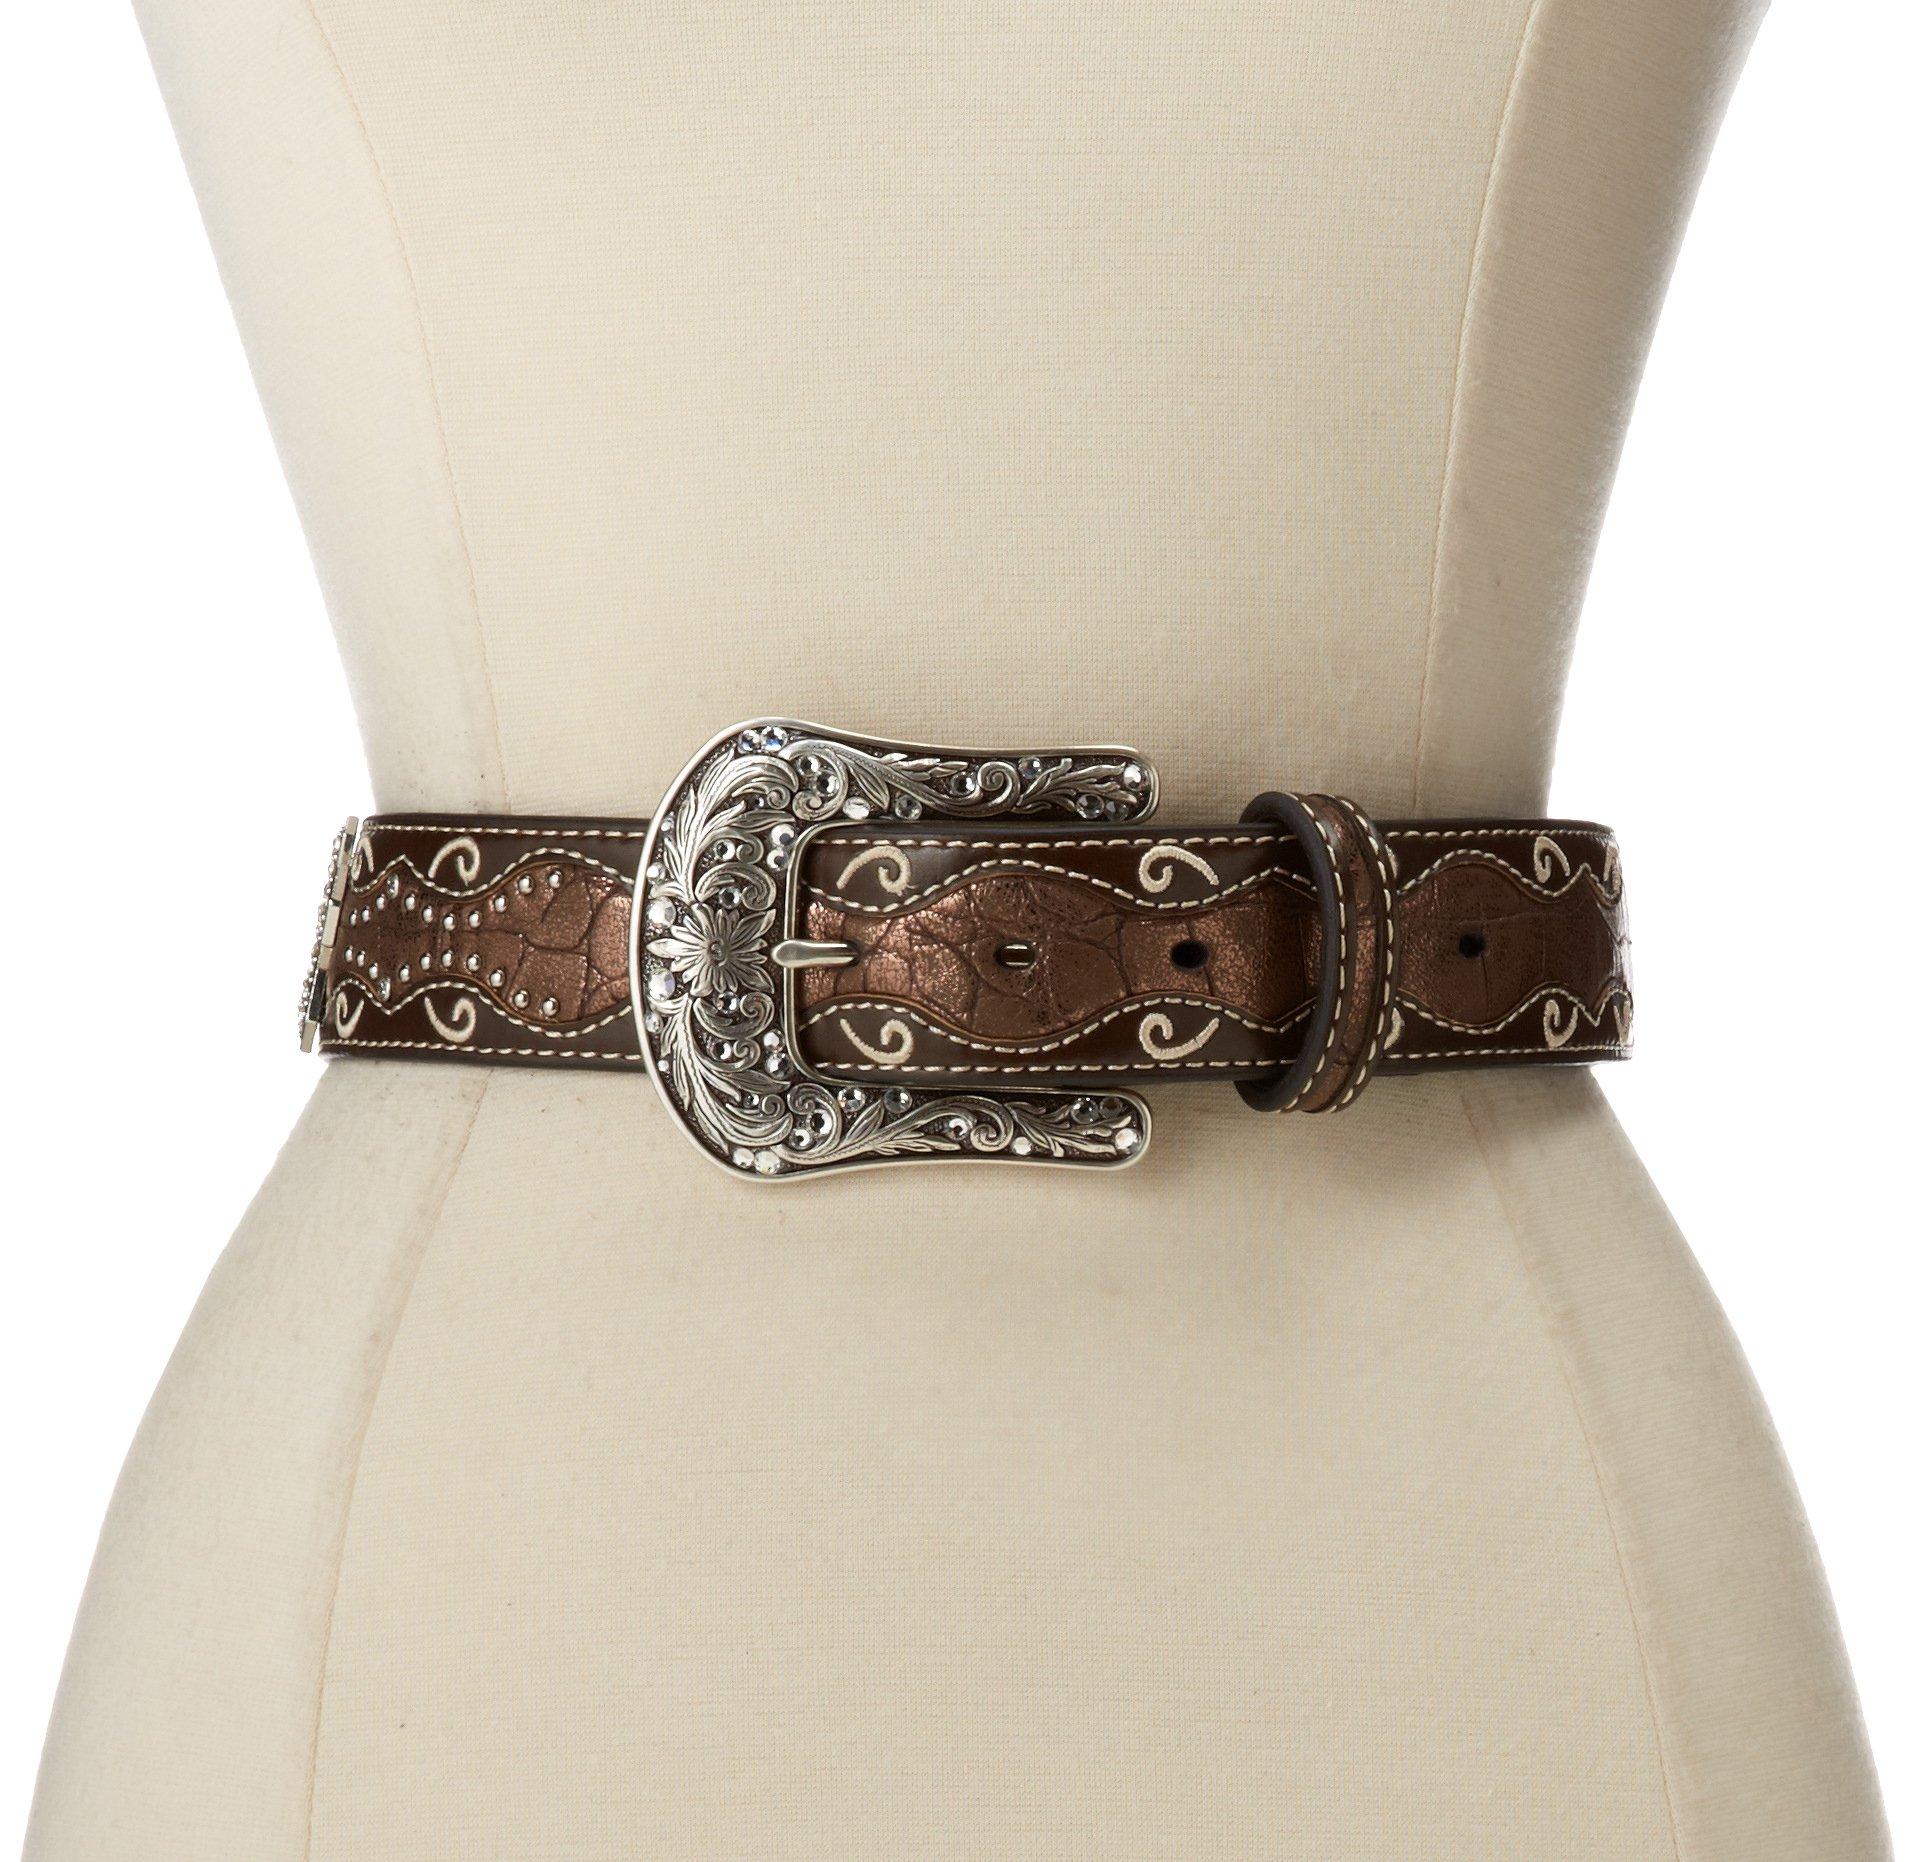 Ariat Women's Patent Inlay Crystal Cross Belt,Brown,L